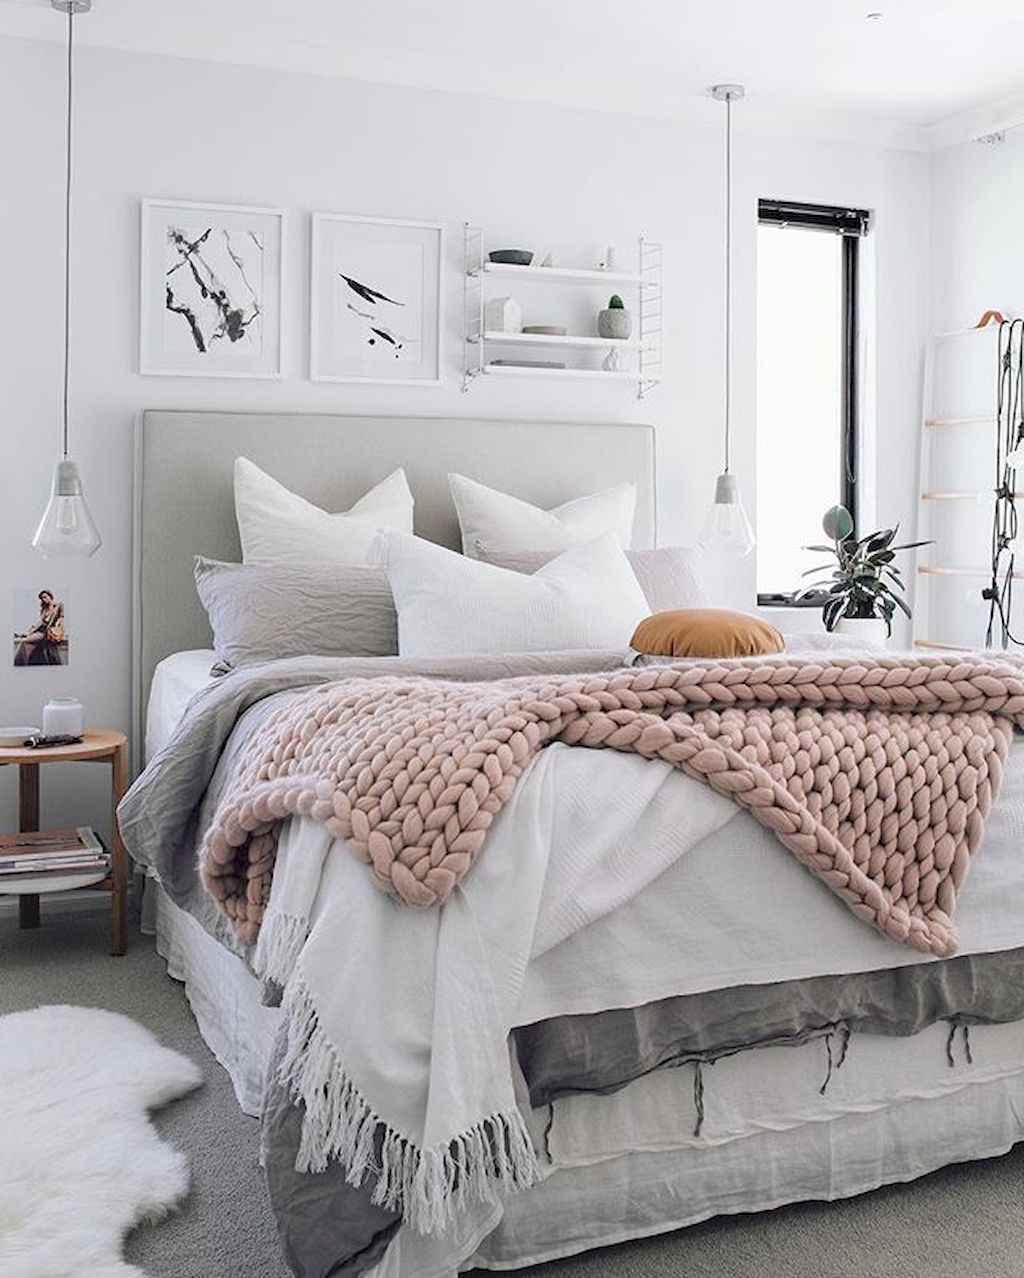 Incredible master bedroom ideas (49)